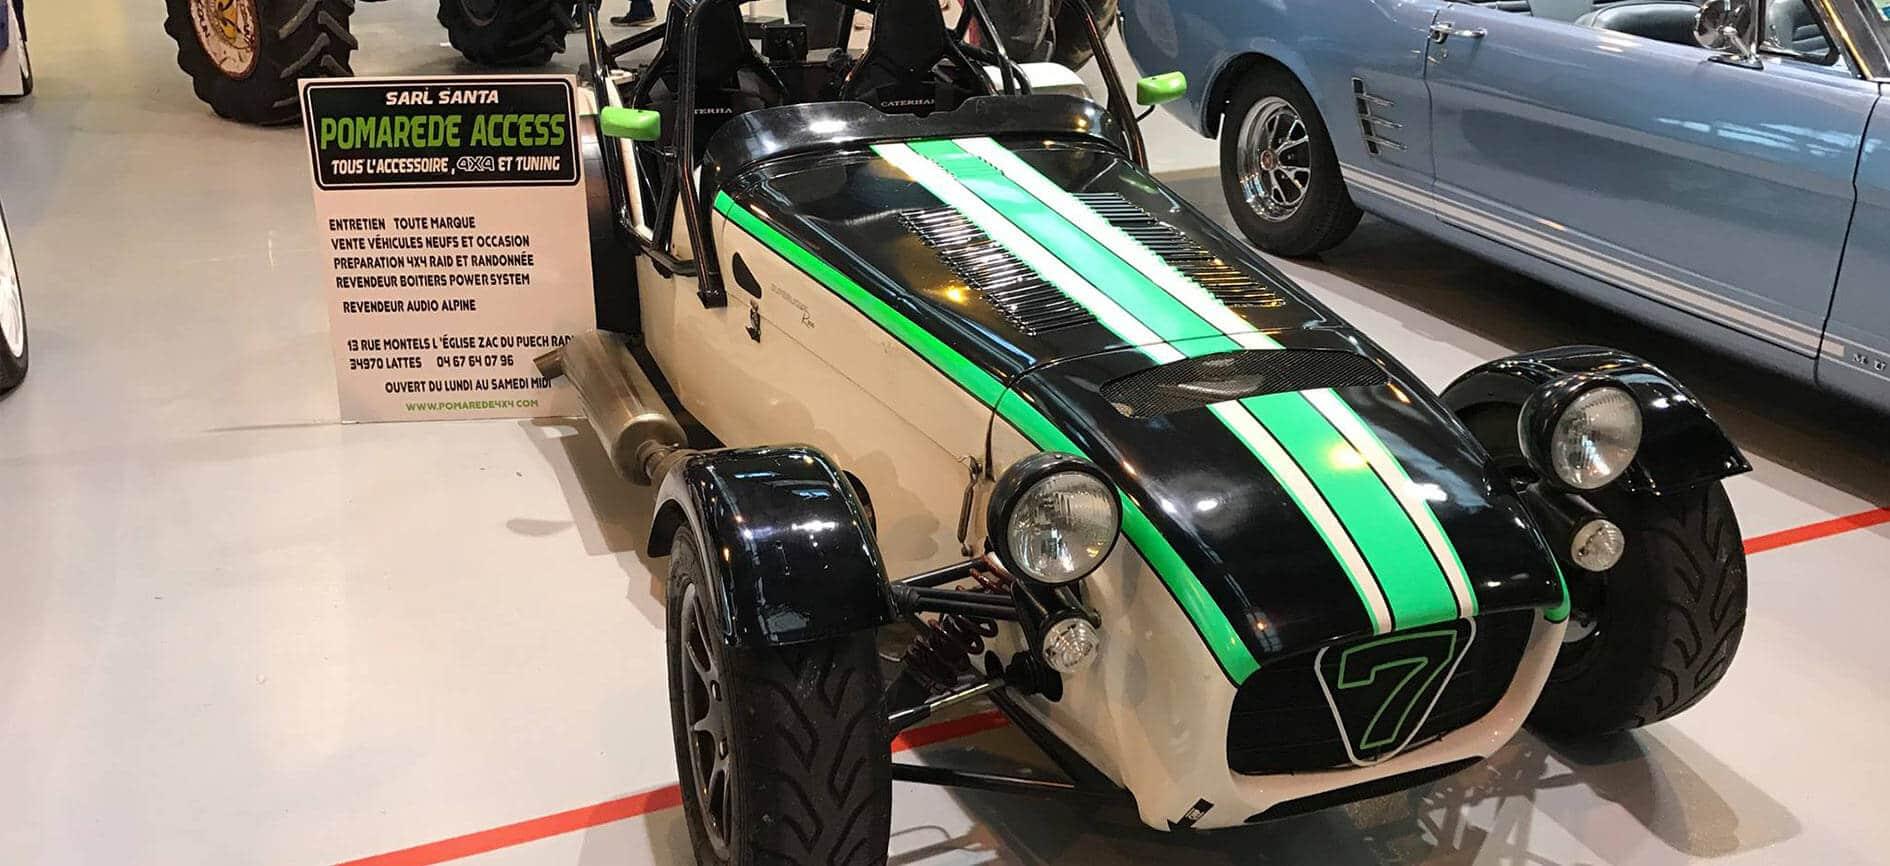 Passion automobile garage pomarede access montpellier - Garage automobile montpellier ...